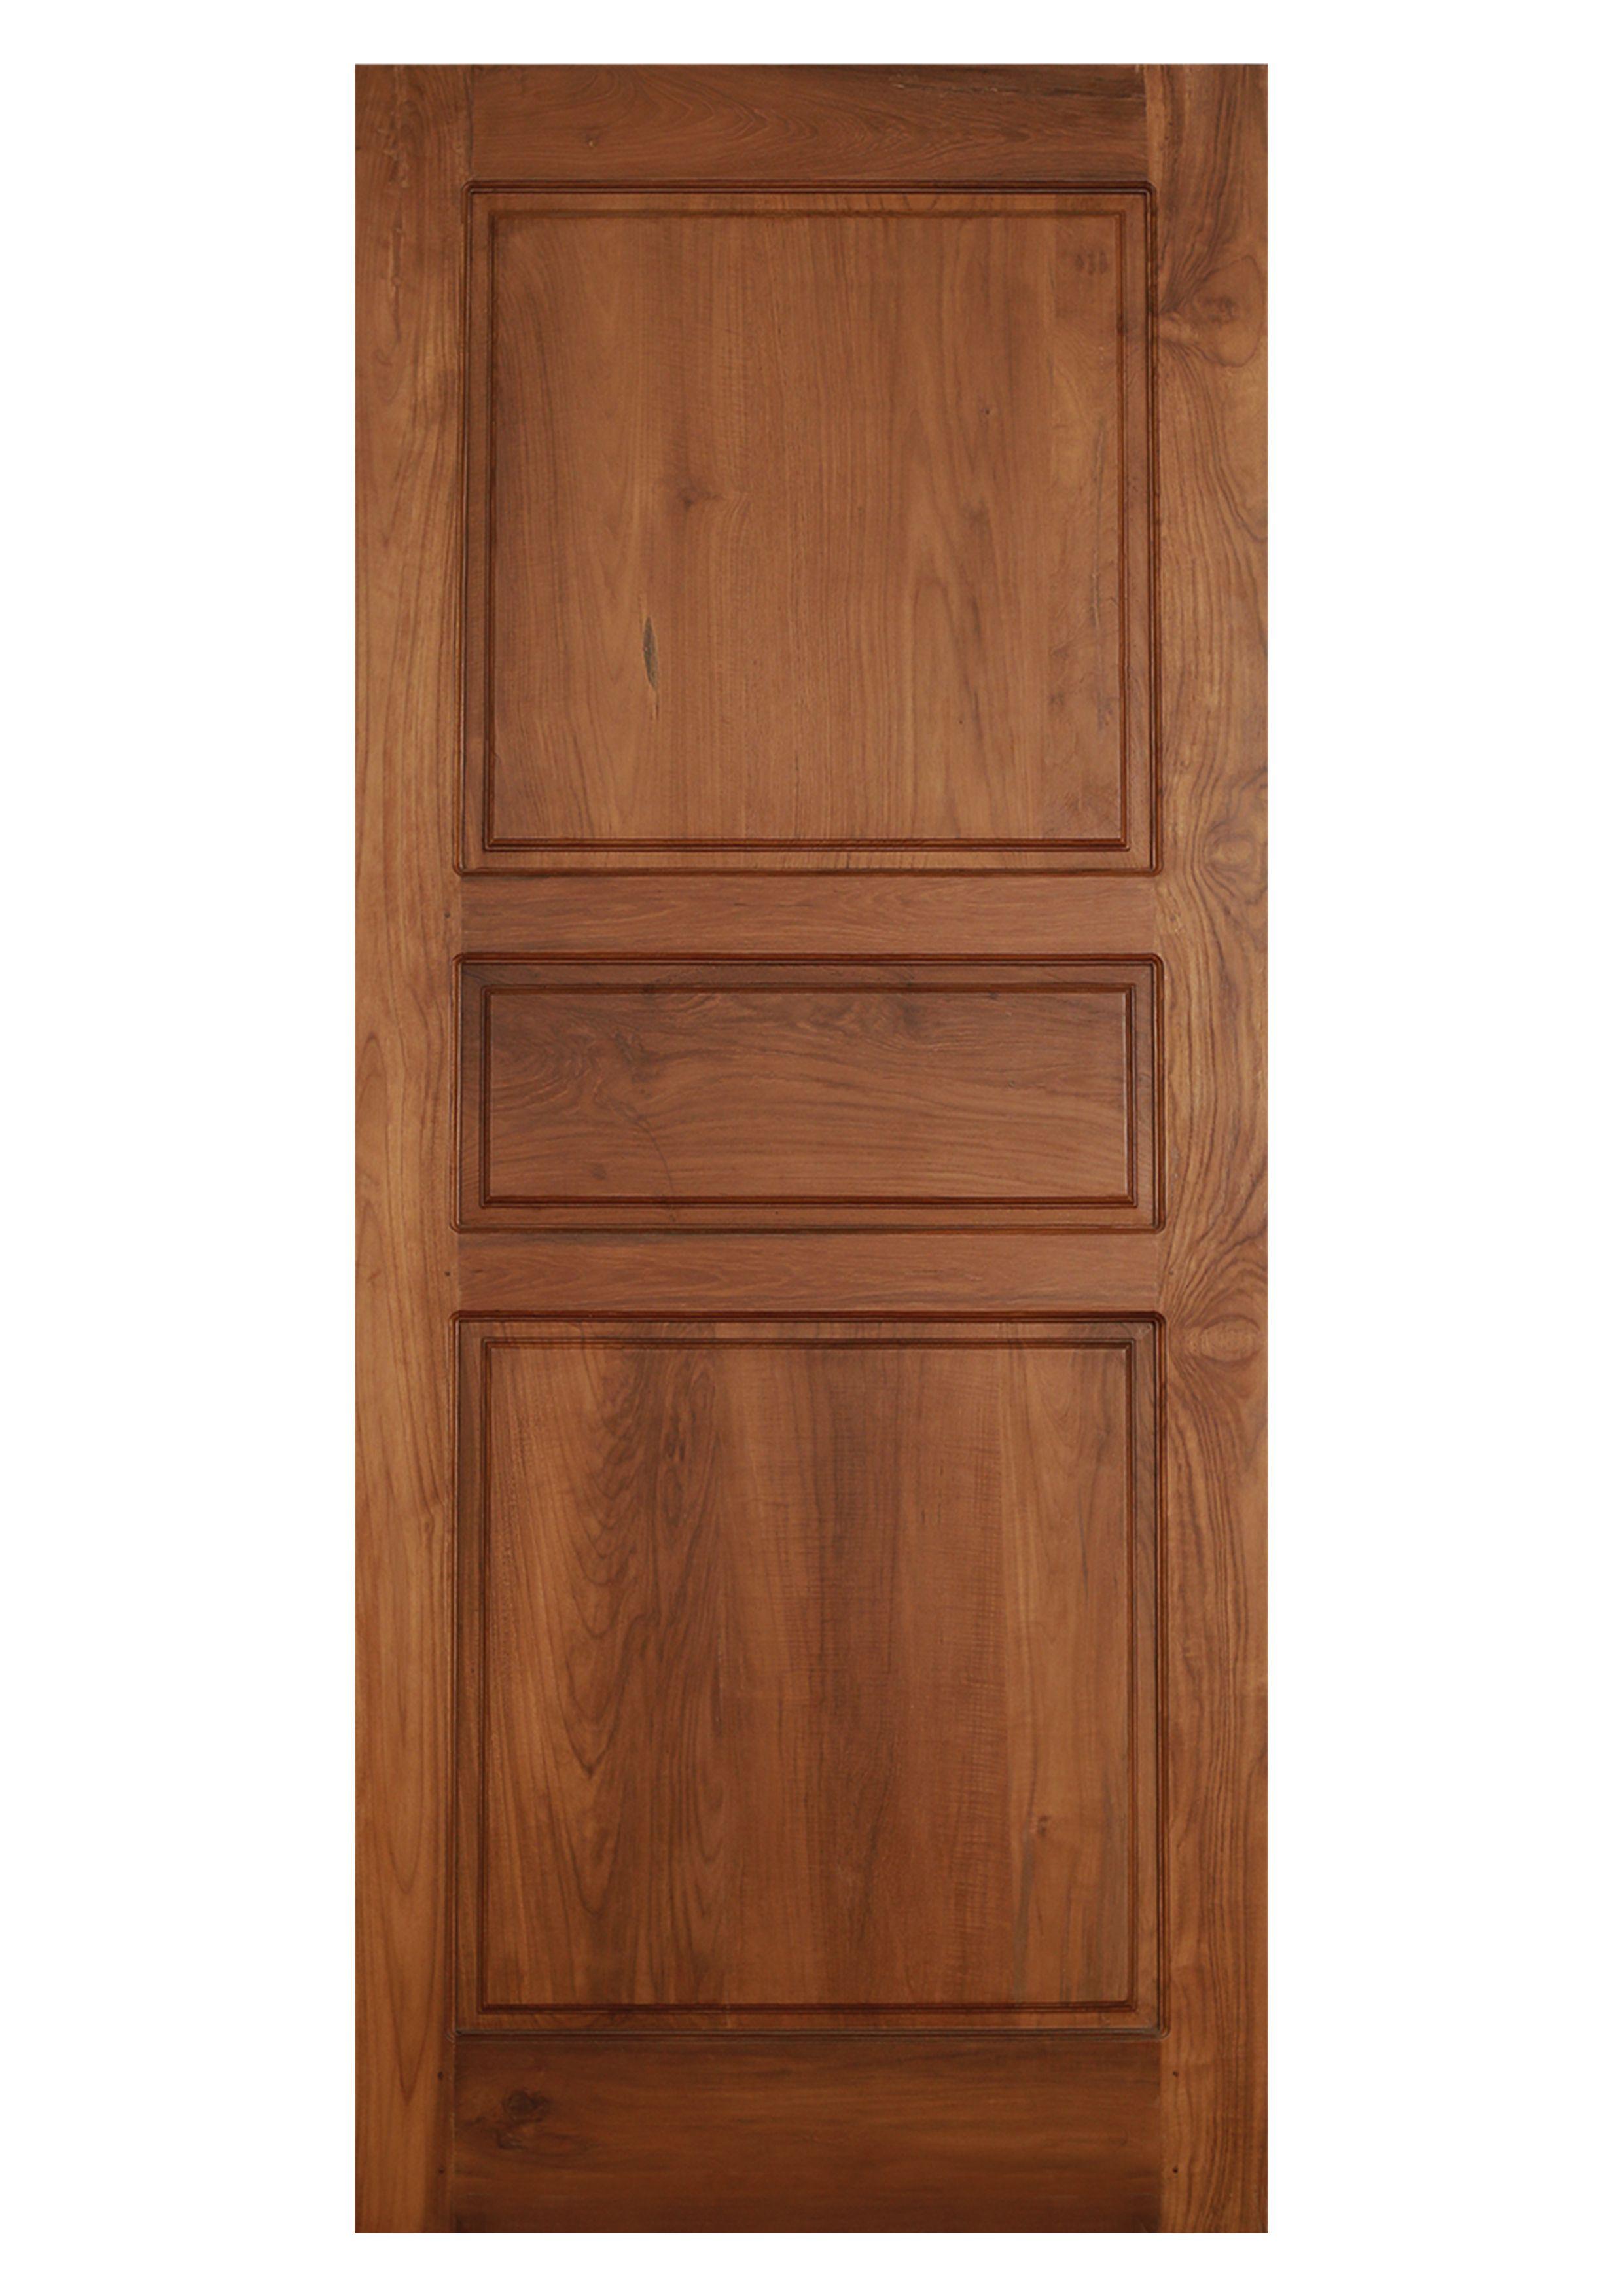 Pin by arul ambali on plain doors pinterest doors